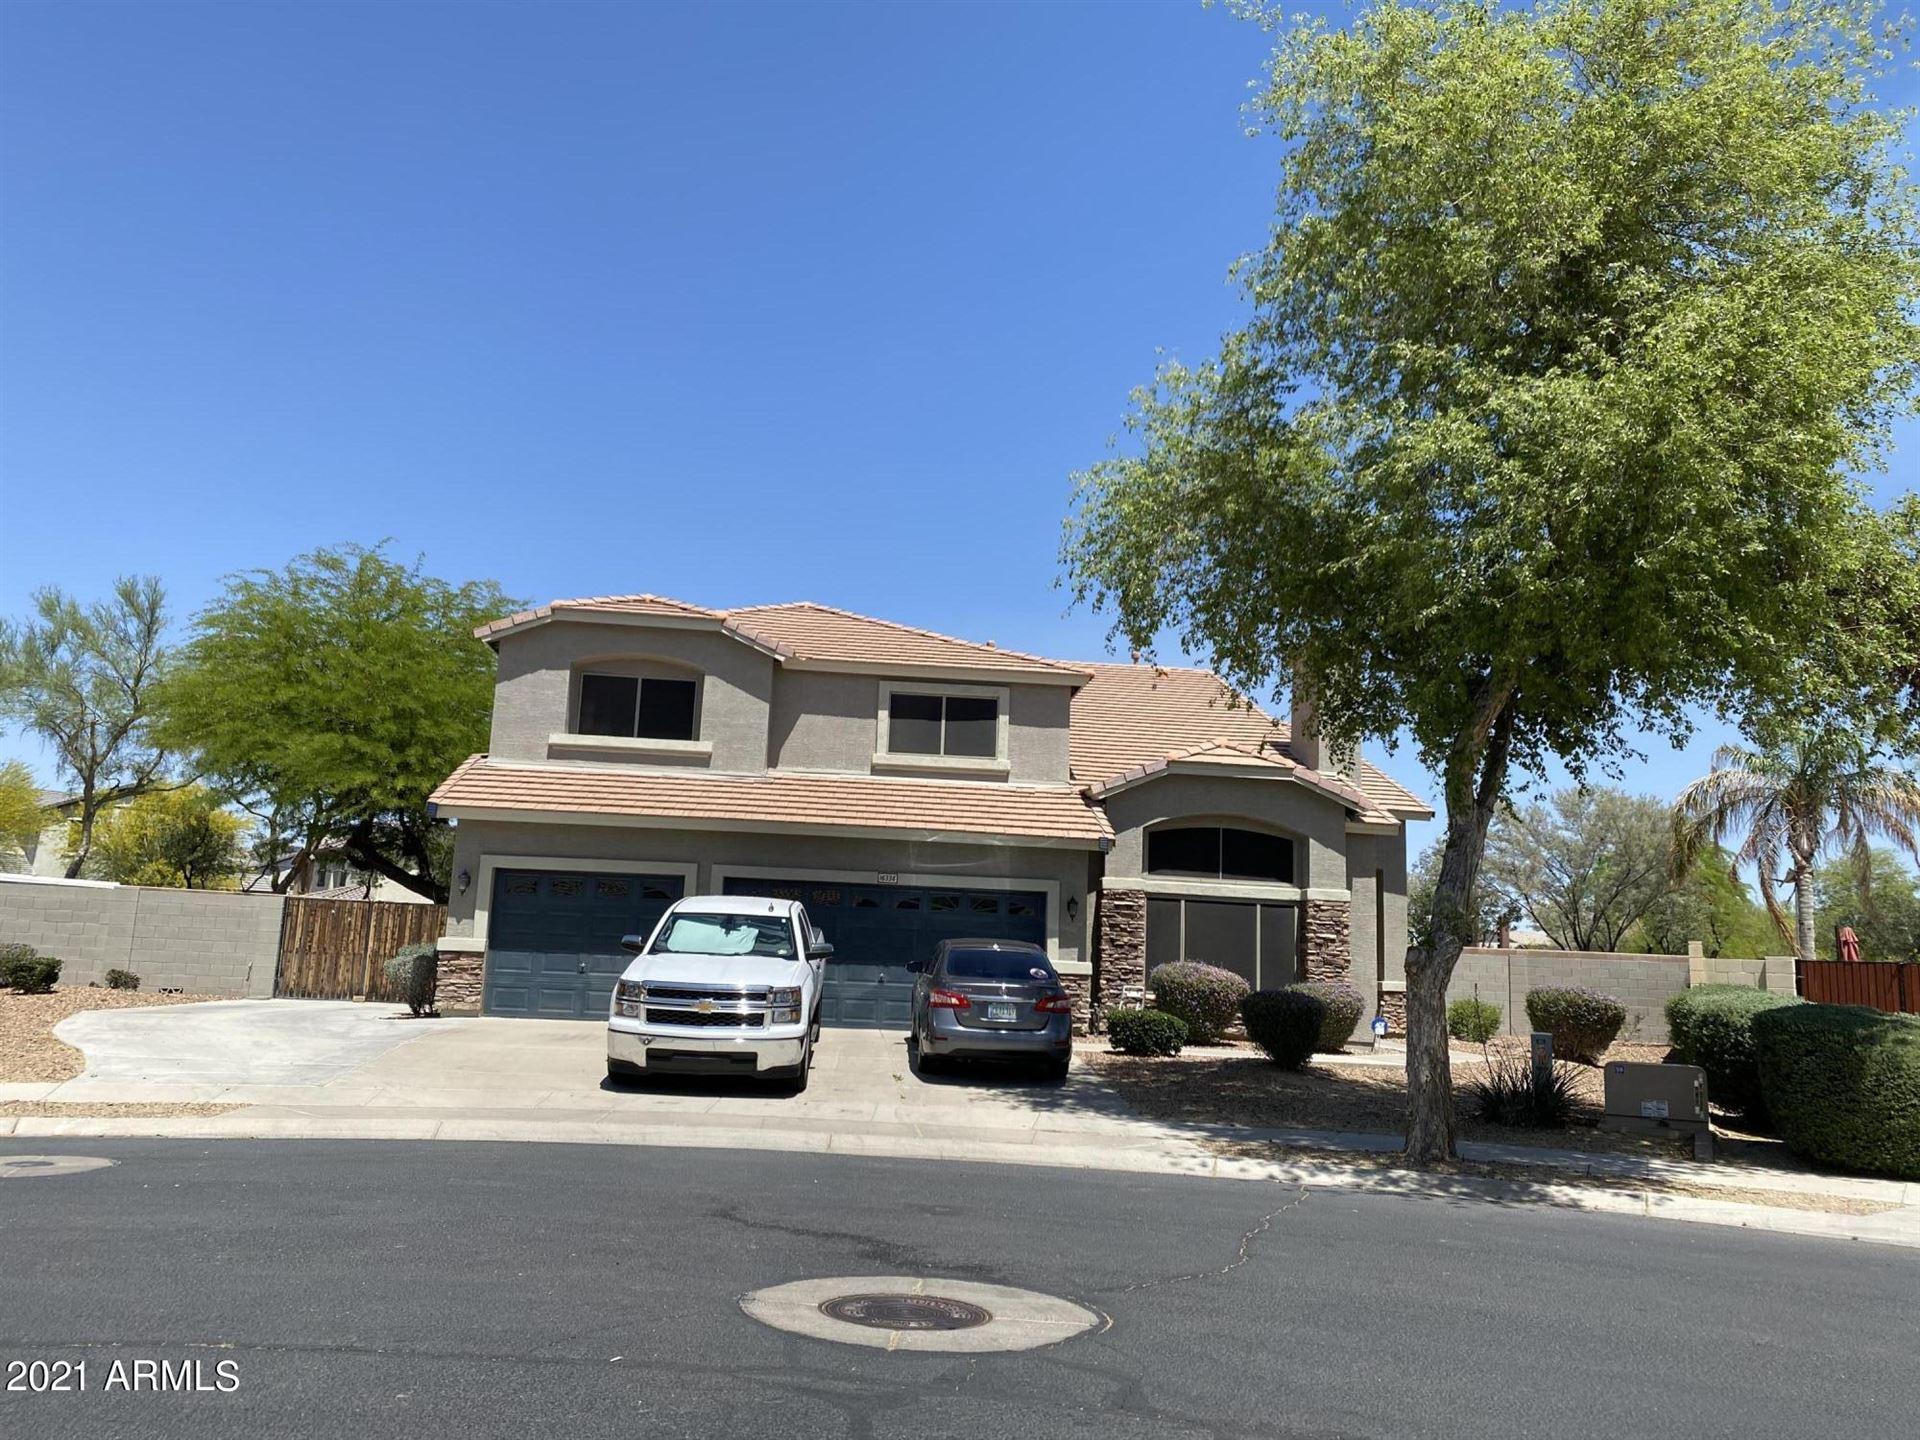 16334 W ROOSEVELT Street, Goodyear, AZ 85338 - MLS#: 6229720